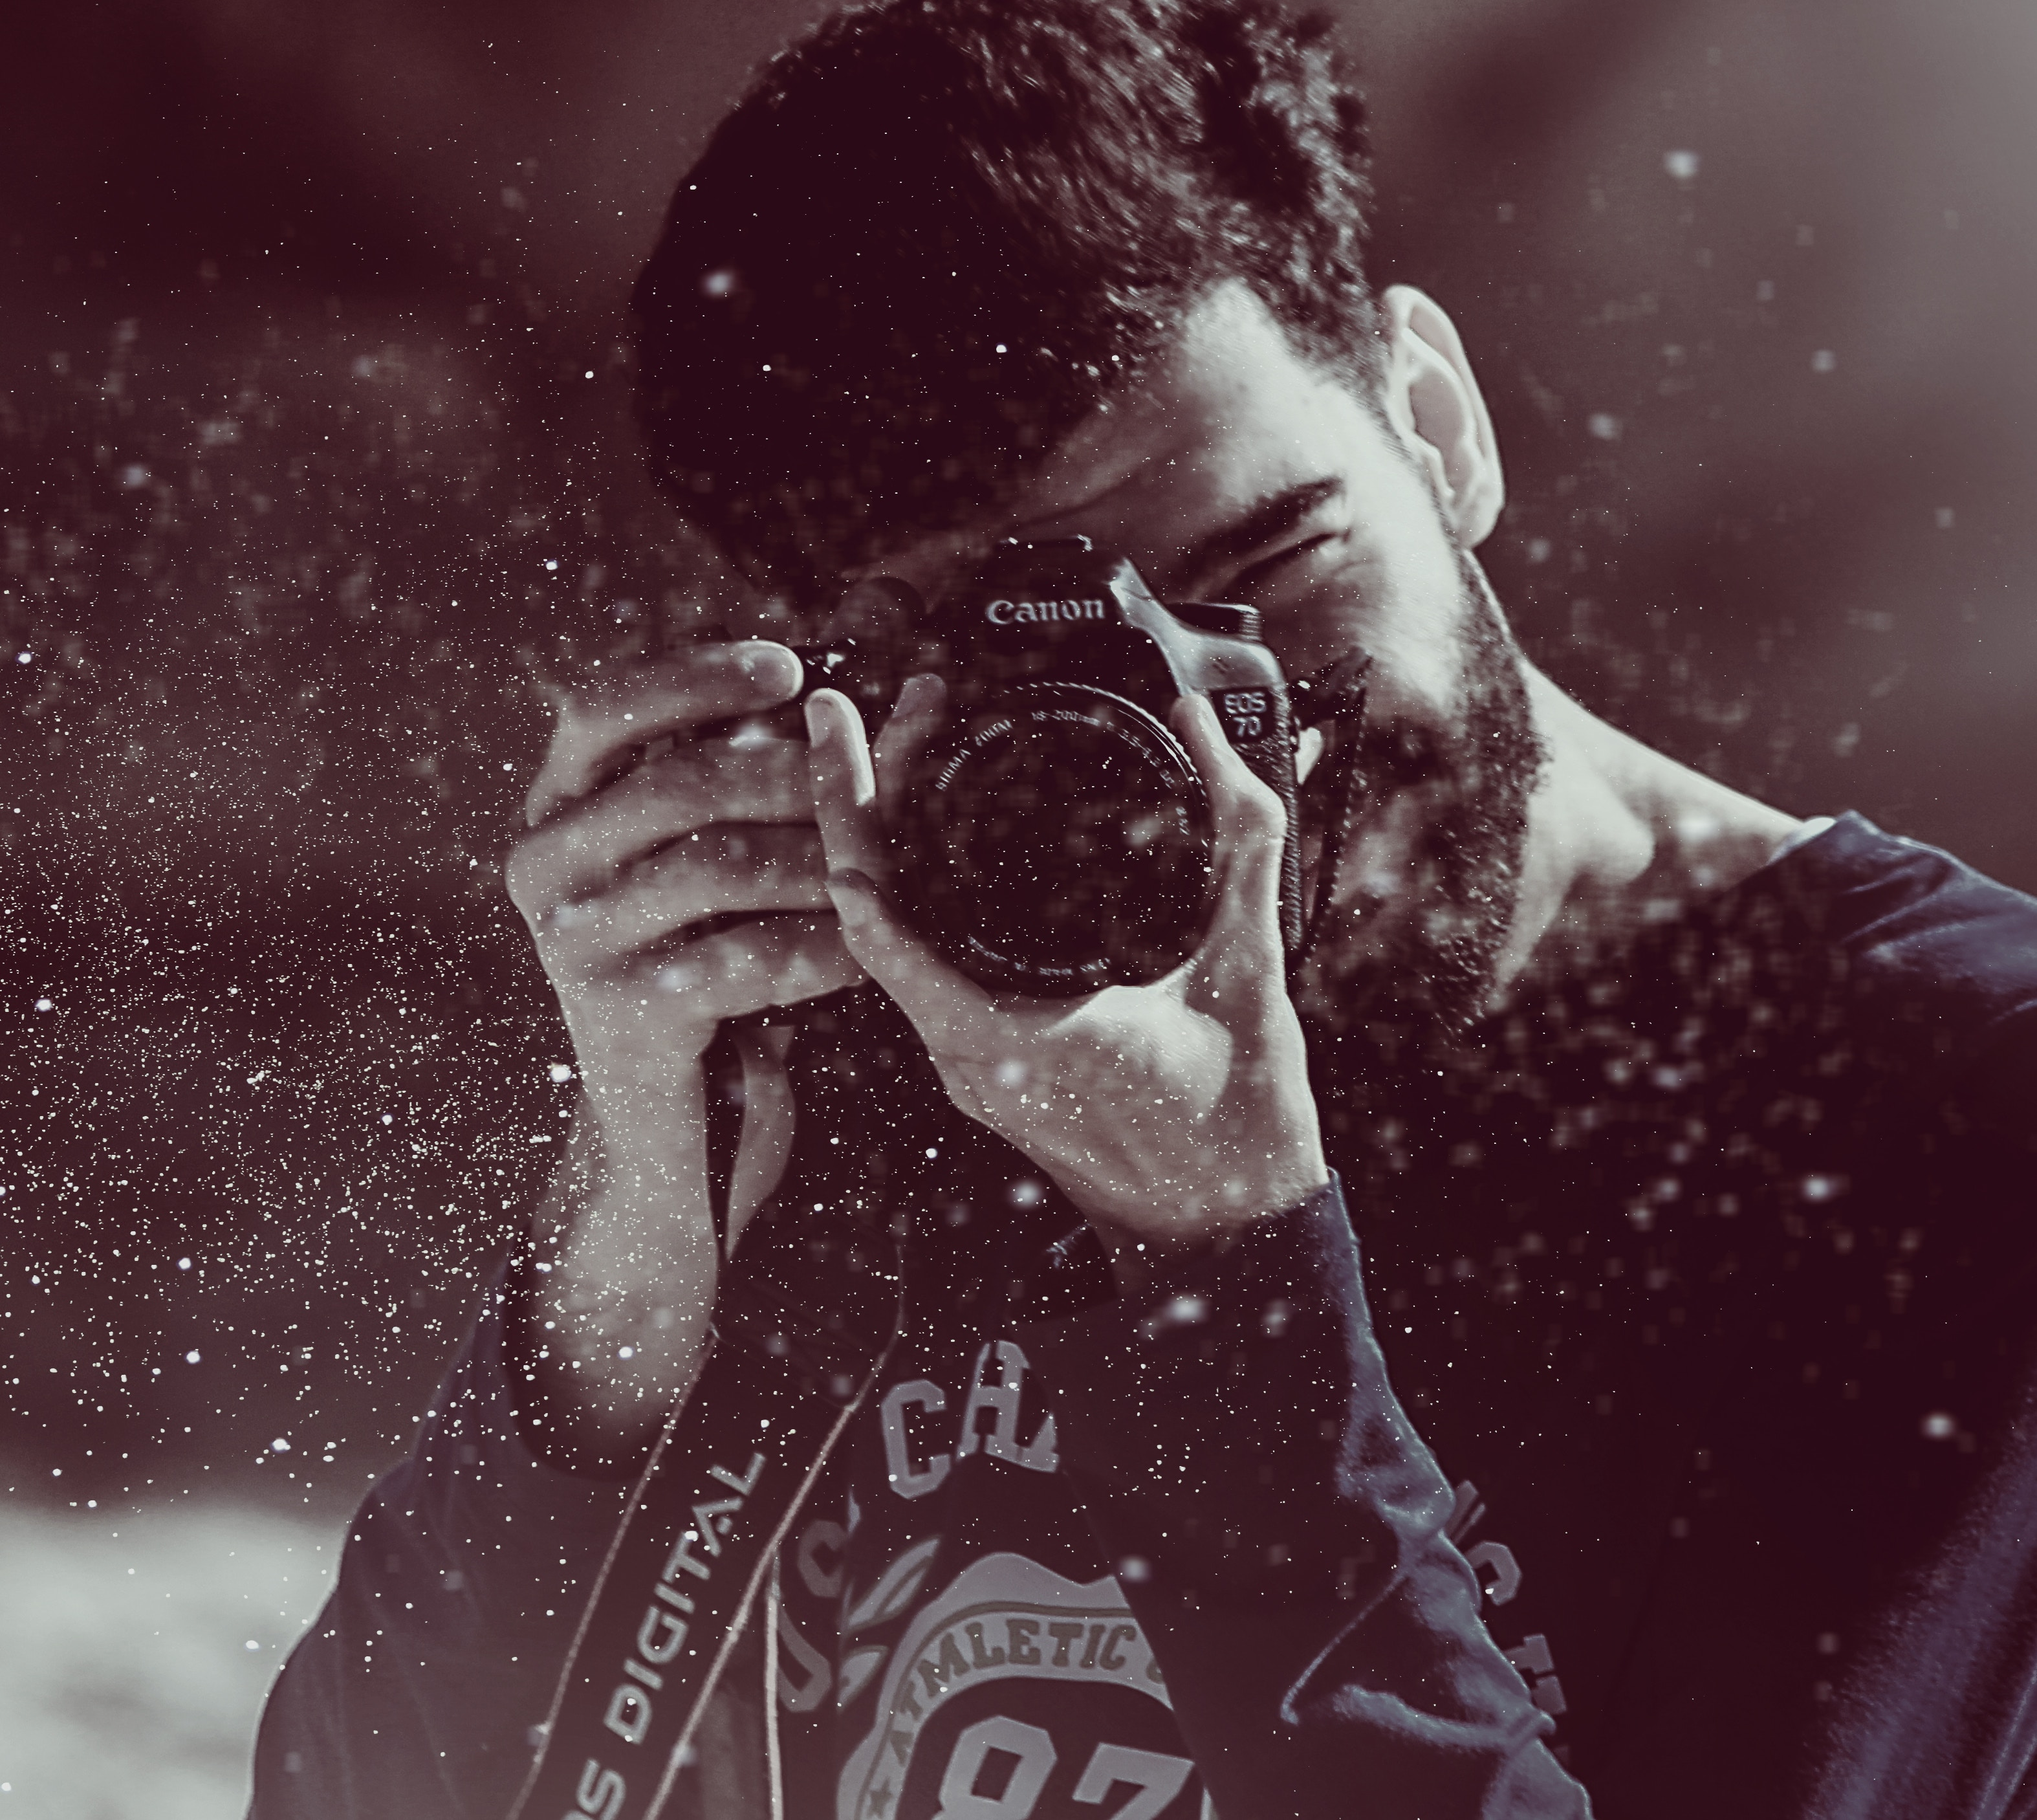 fashion photography courses